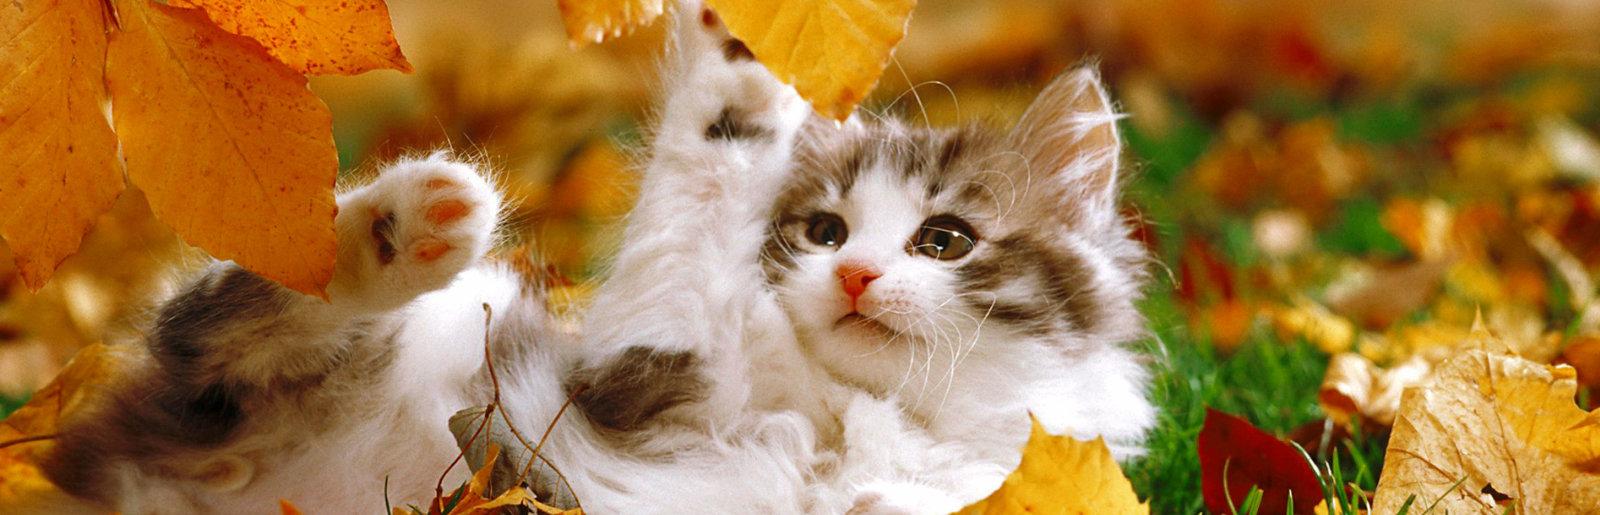 Těsná bílá dívka kočička